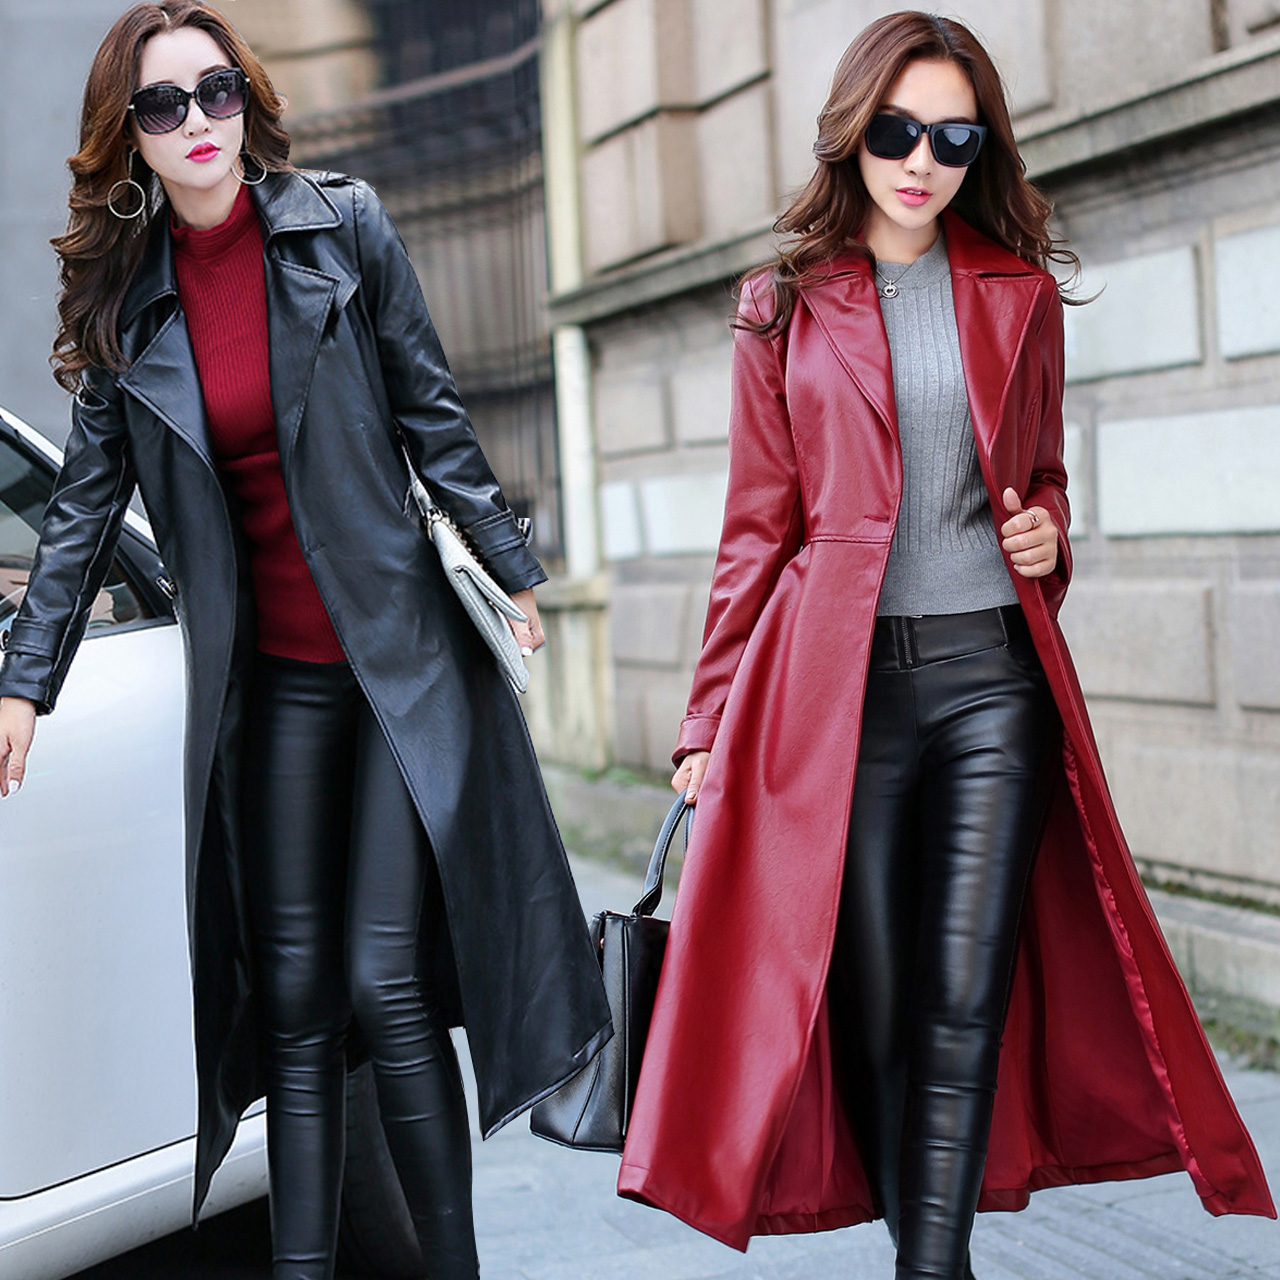 Leather Long Jacket Women New Spring Autumn Faux Pu  Full Sleeve Coat  Empire Waist Outwear Burgundy Black